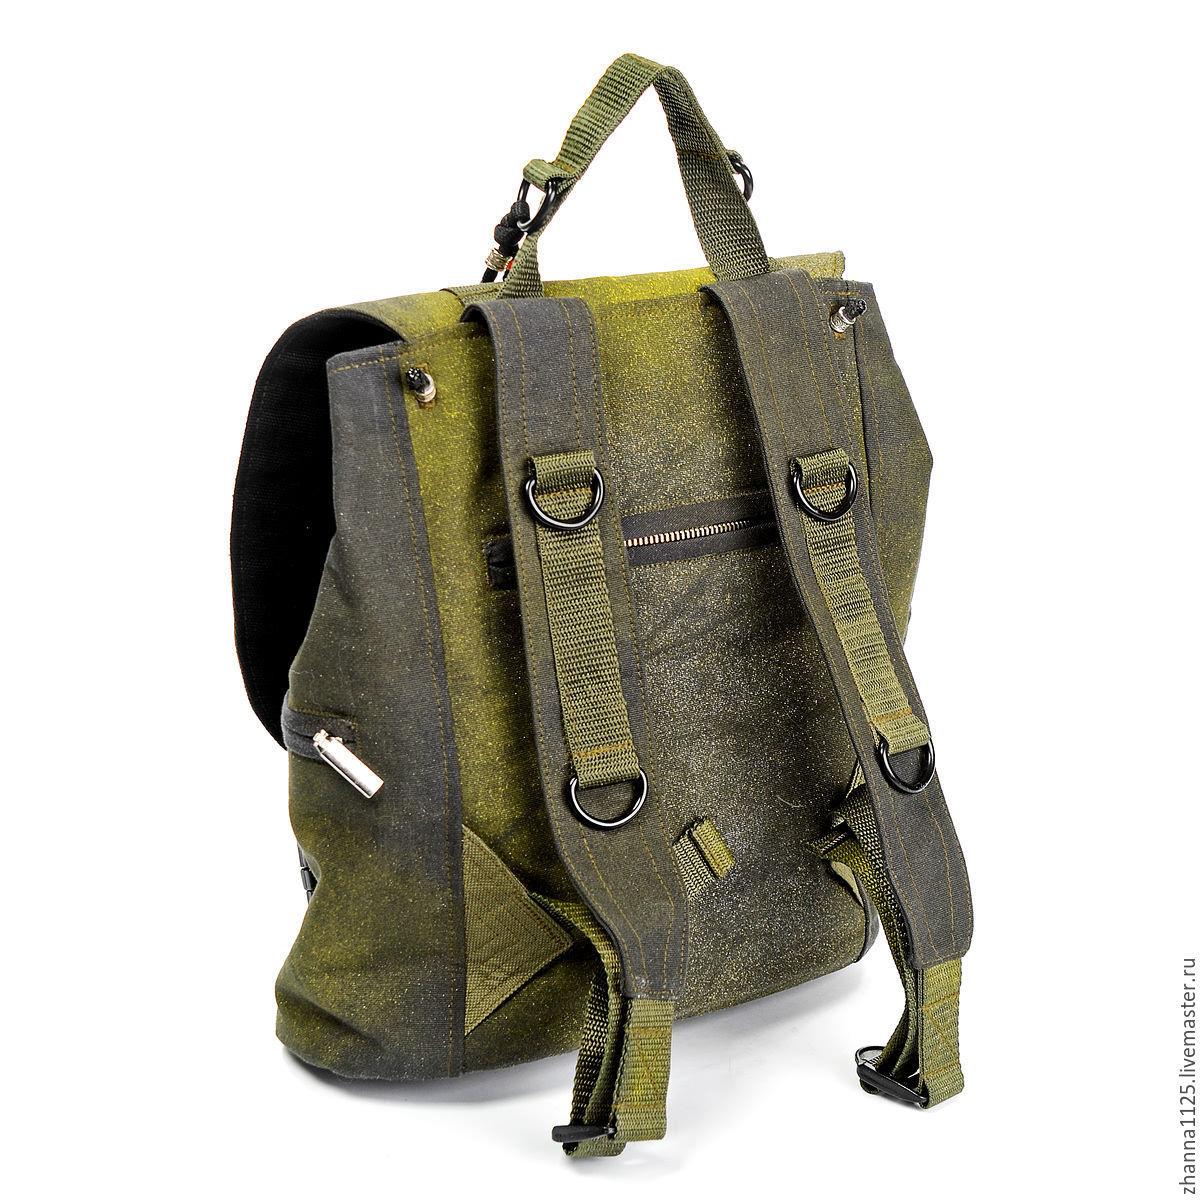 Рюкзак перевод на белорусский рюкзак vanguard sedona 41kg brown